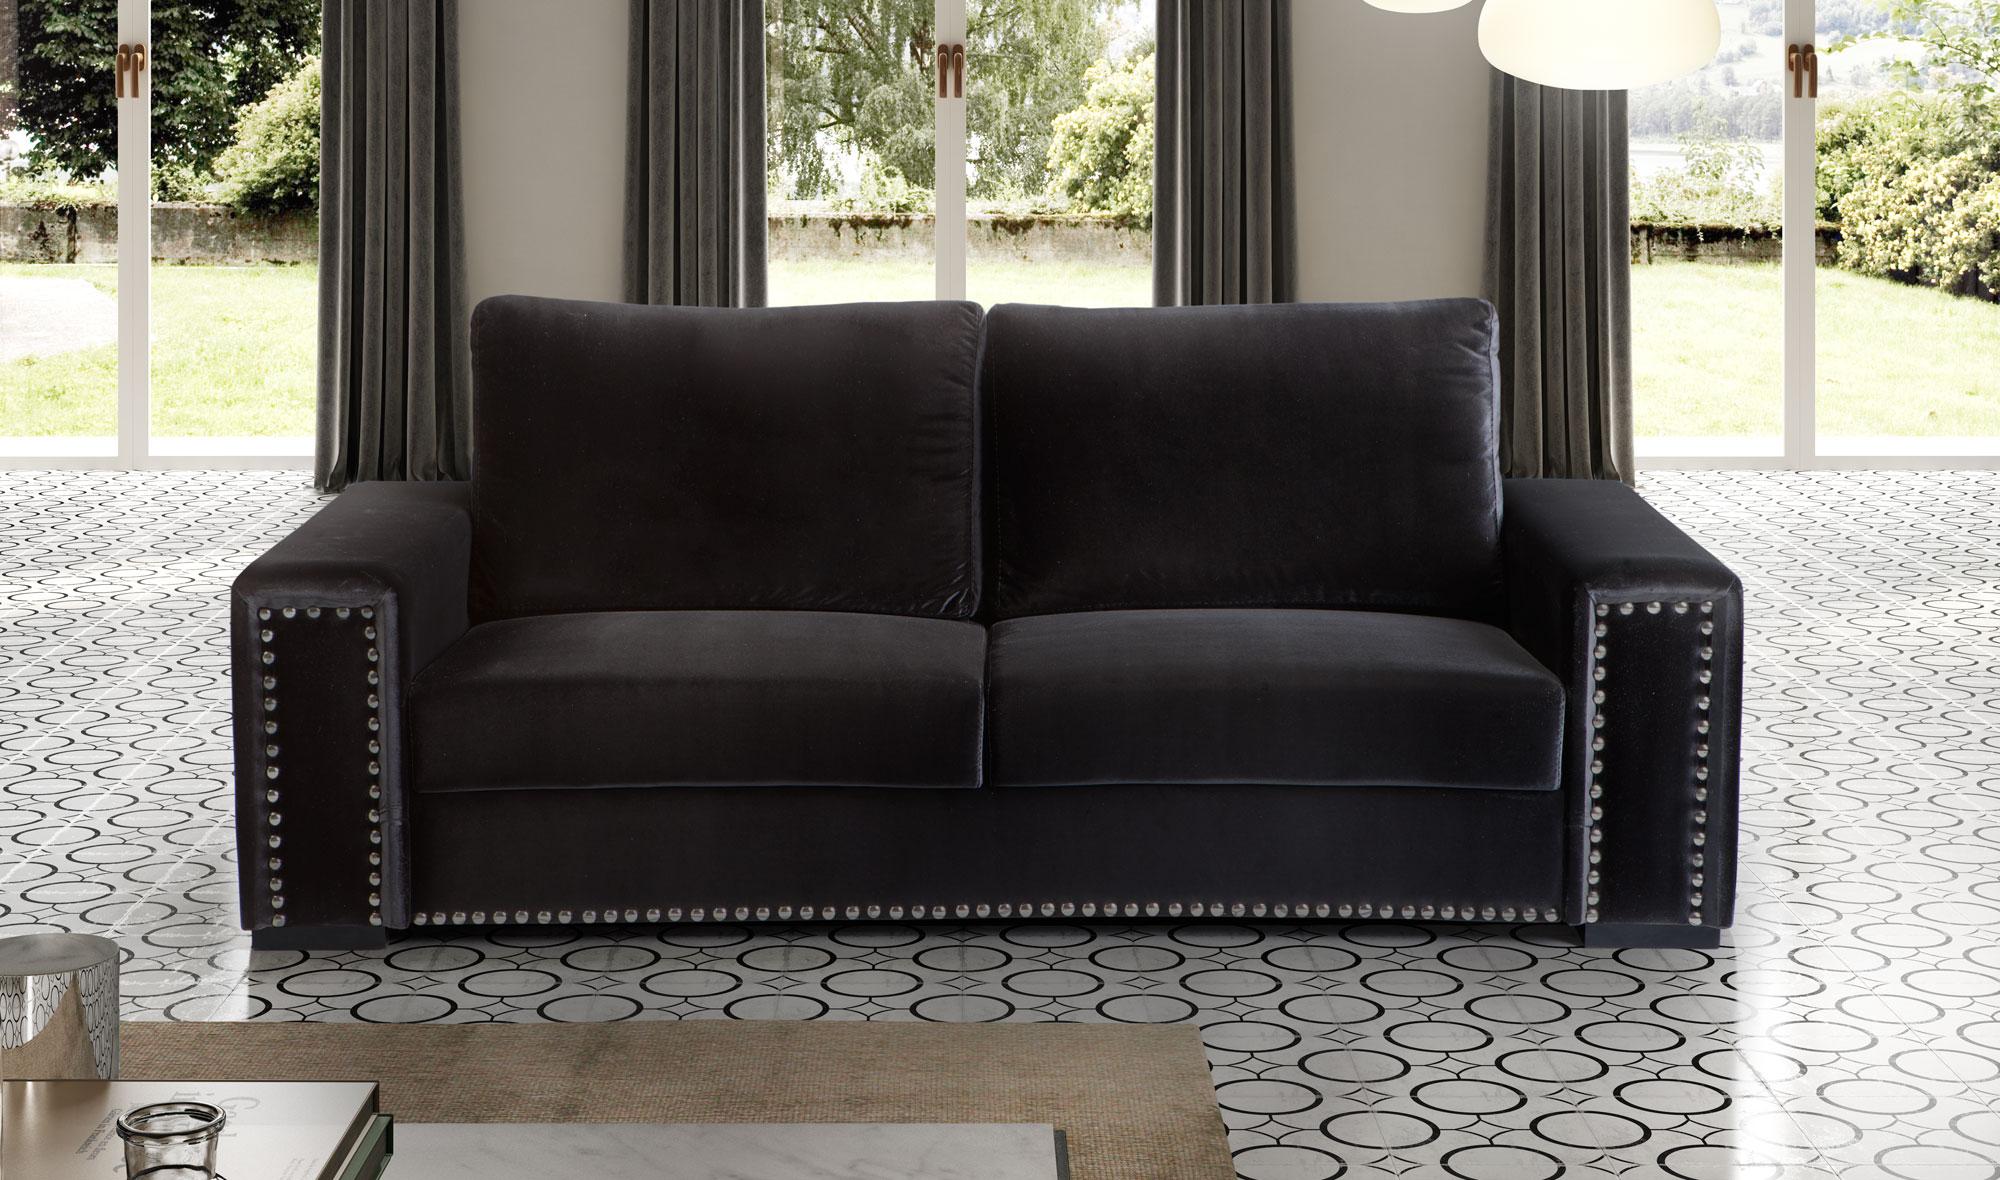 Sofá negro moderno Sharga no disponible en Portobellostreet.es